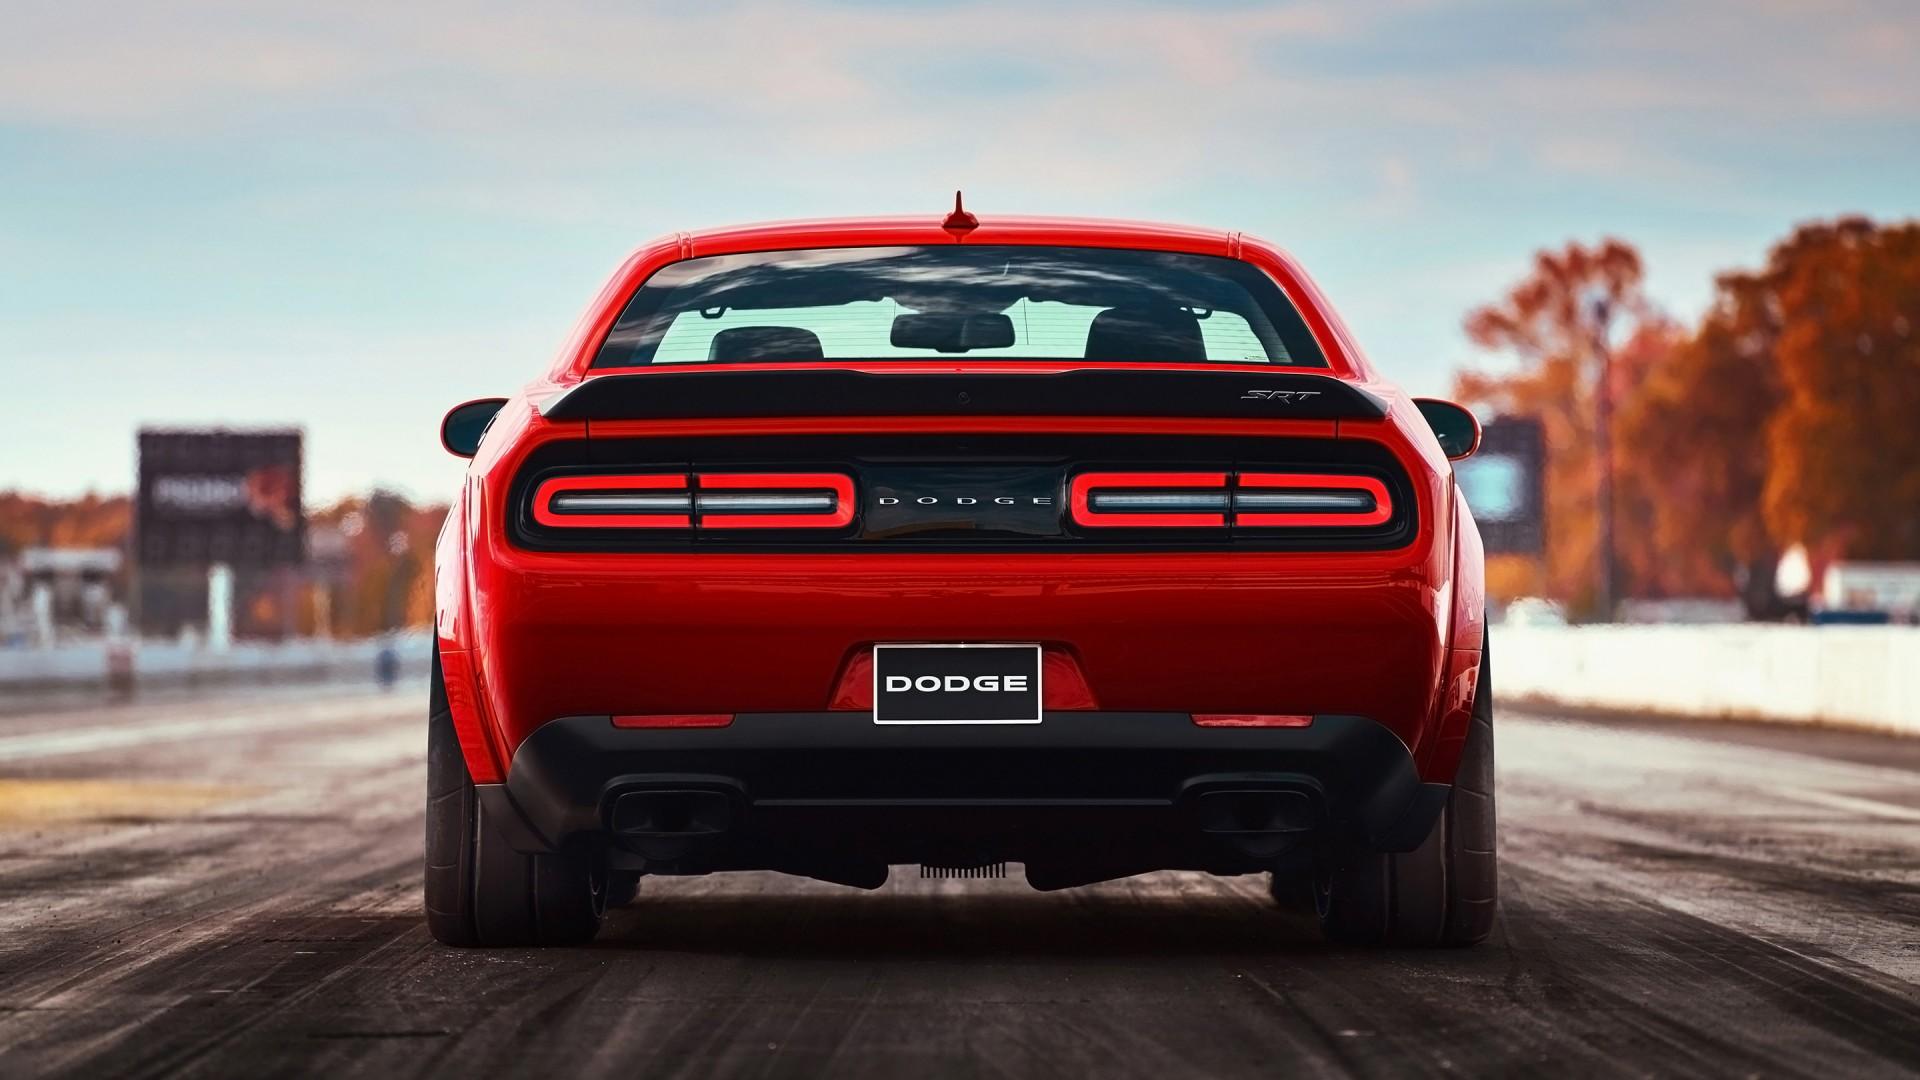 Dodge Srt Demon >> 2018 Dodge Challenger SRT Demon 7 Wallpaper | HD Car Wallpapers | ID #7892